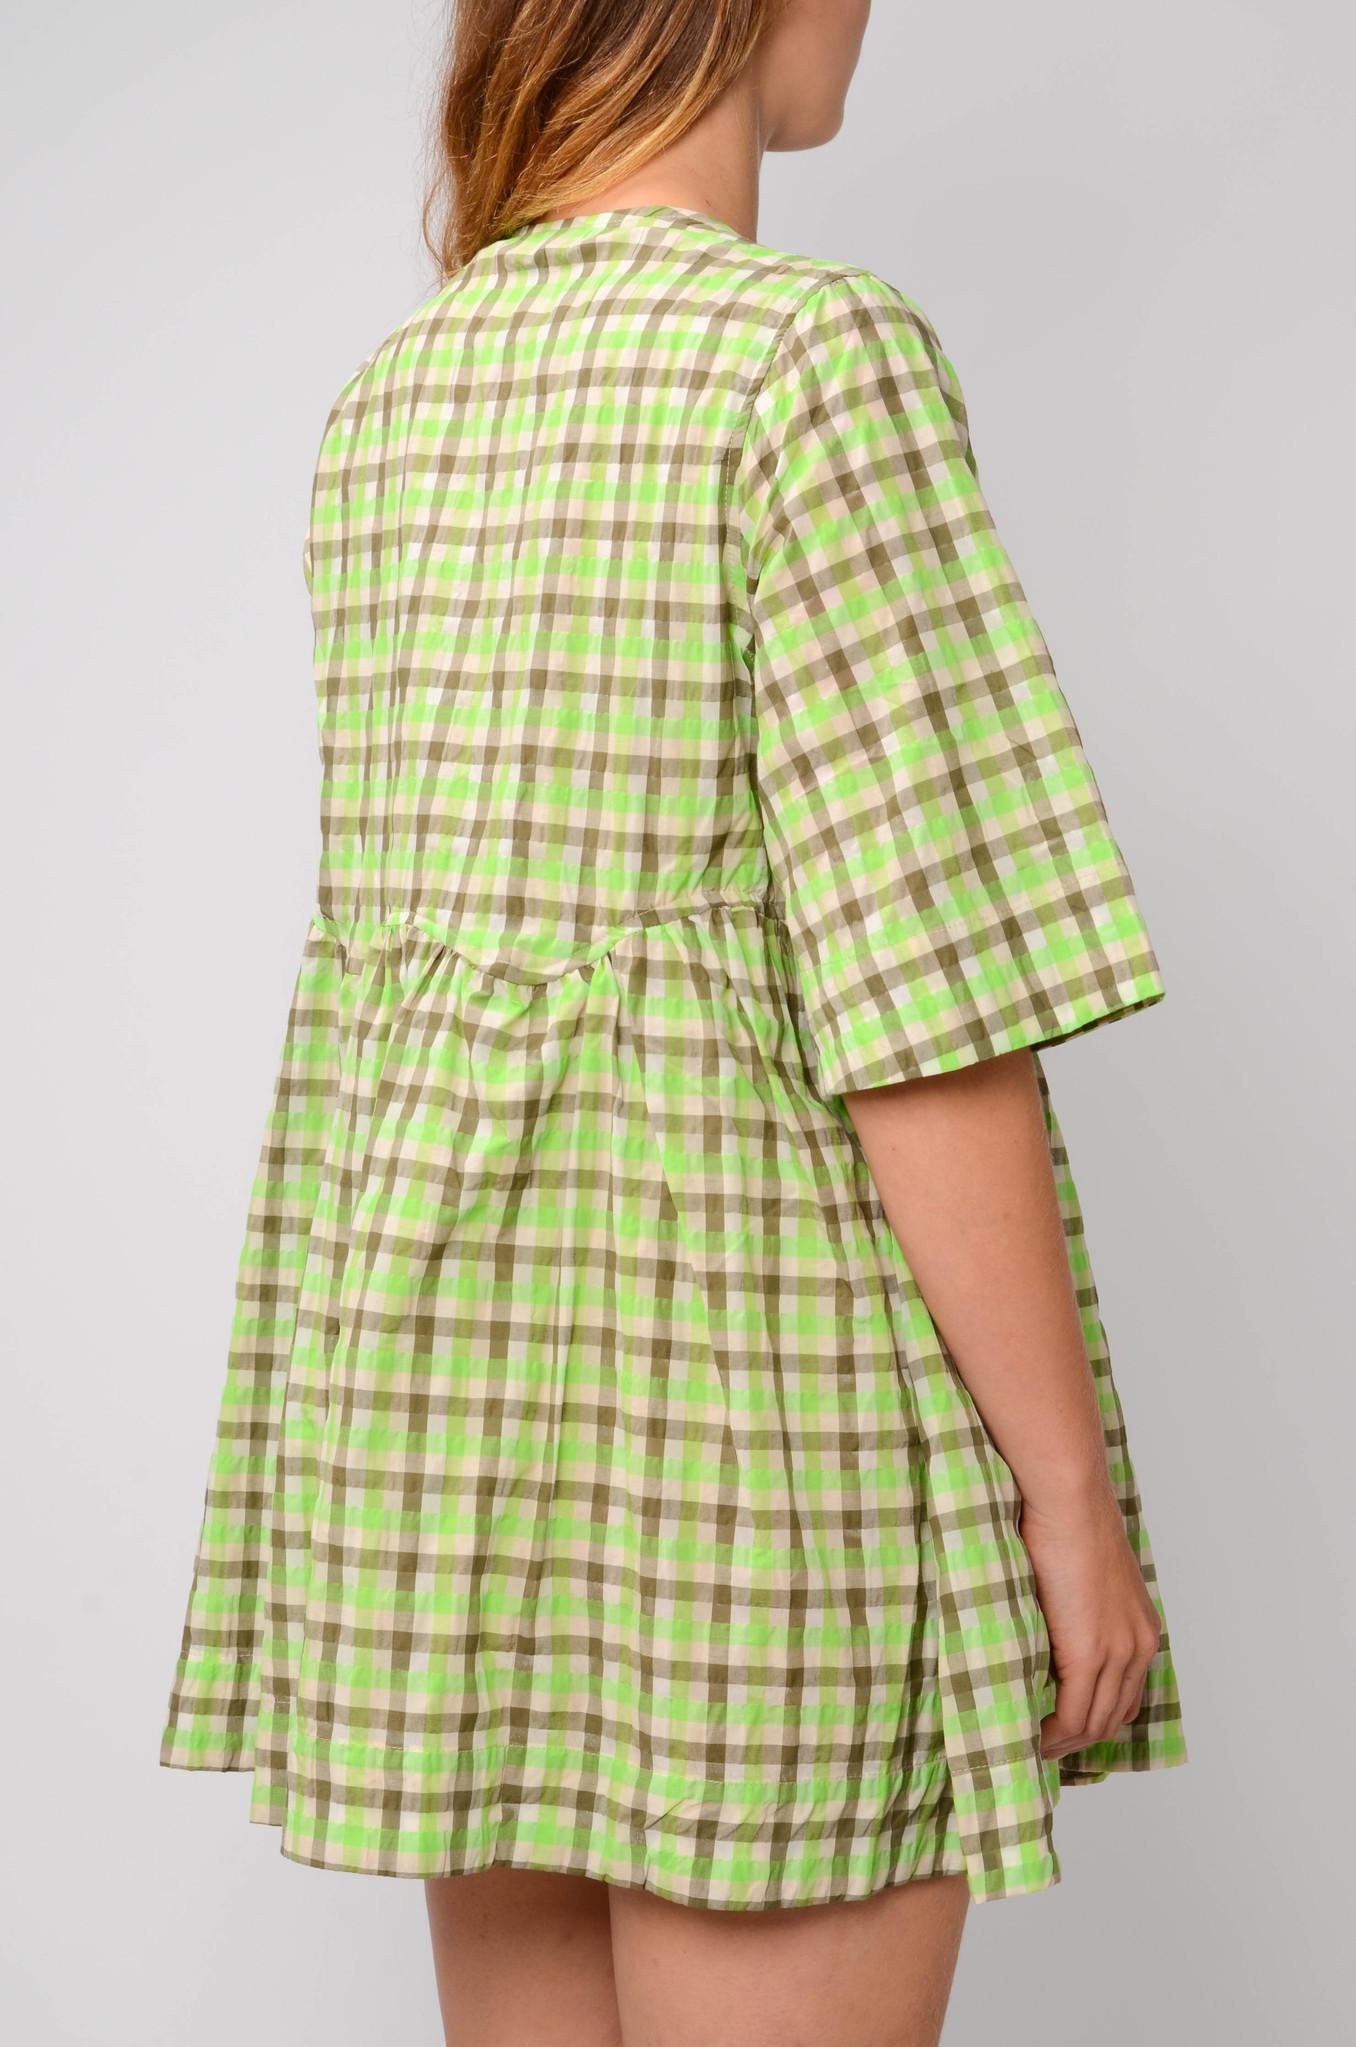 SEERSUCKER BABYDOLL DRESS-4